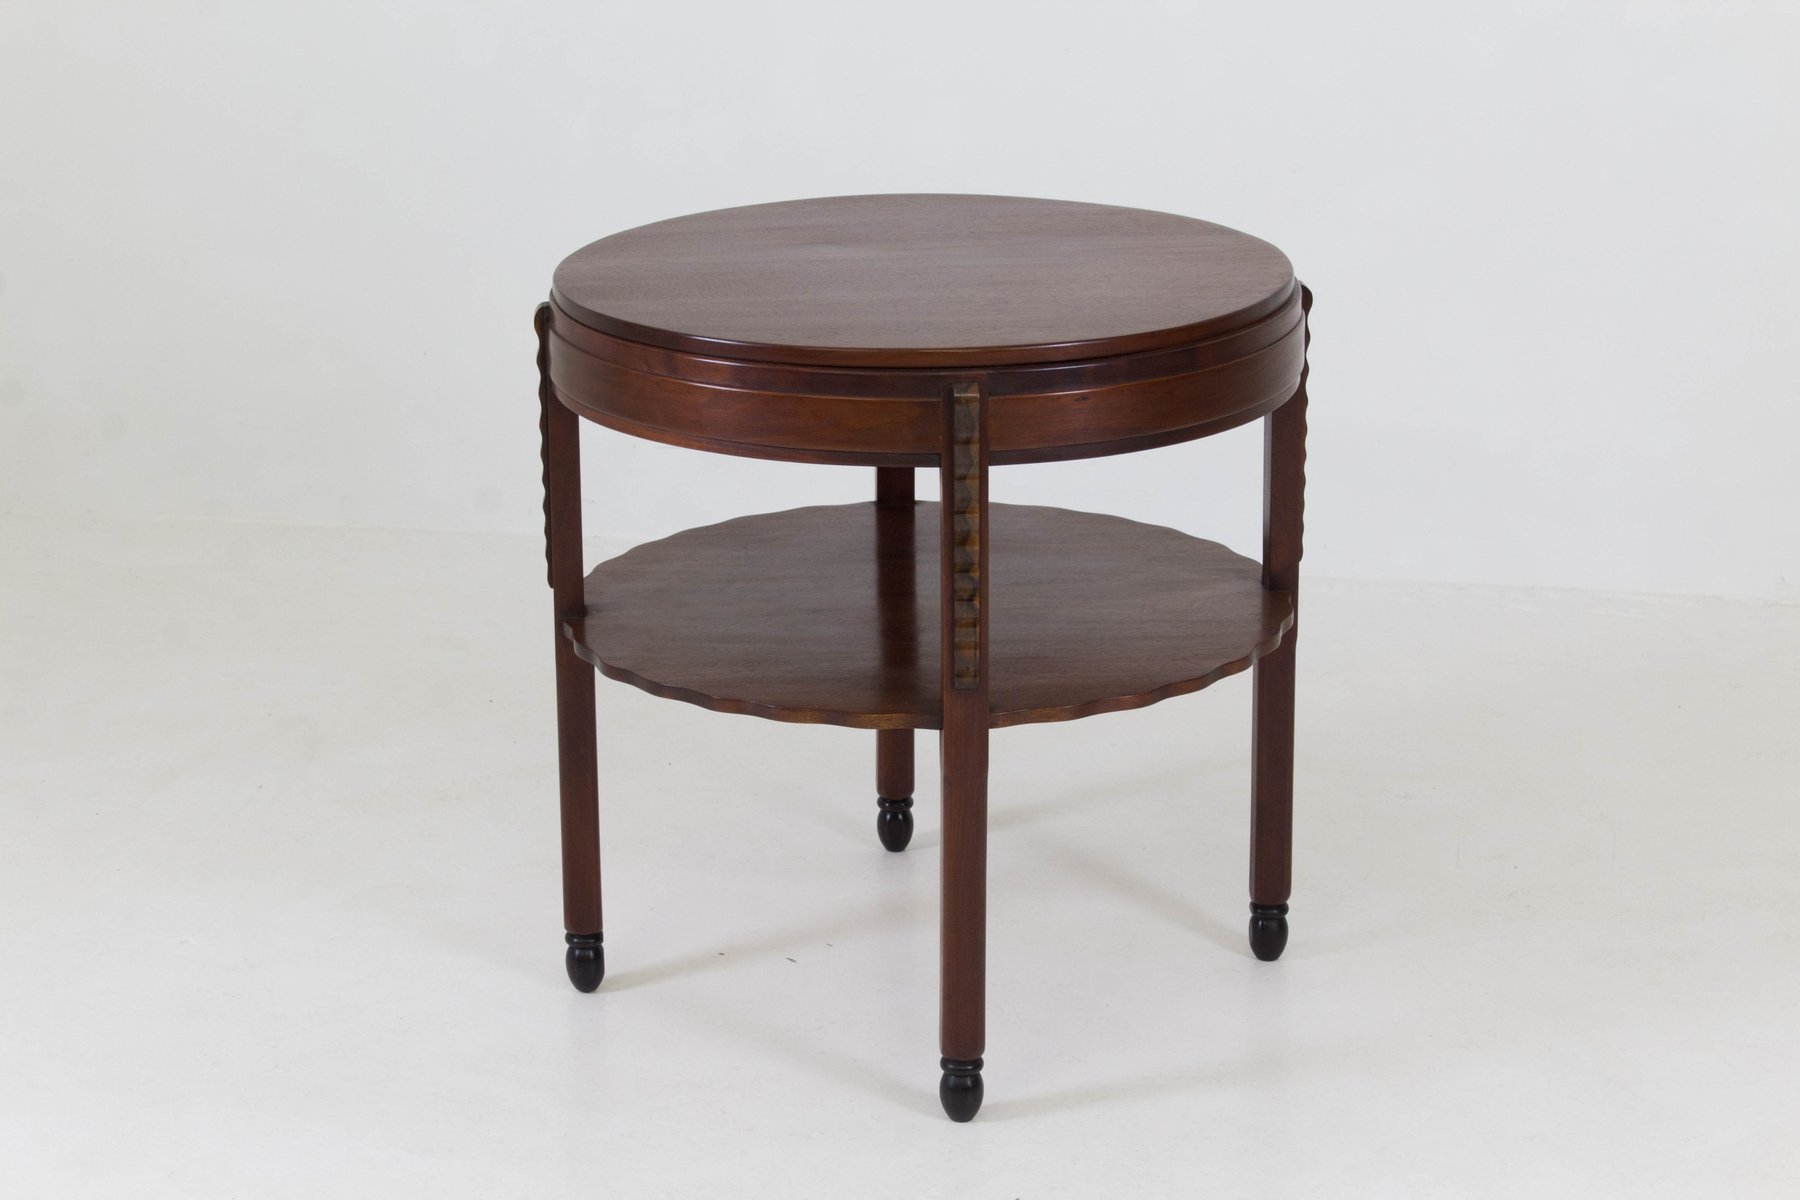 Art Deco Amsterdam School Mahogany Coffee Table From Fa.Drilling, 1920s